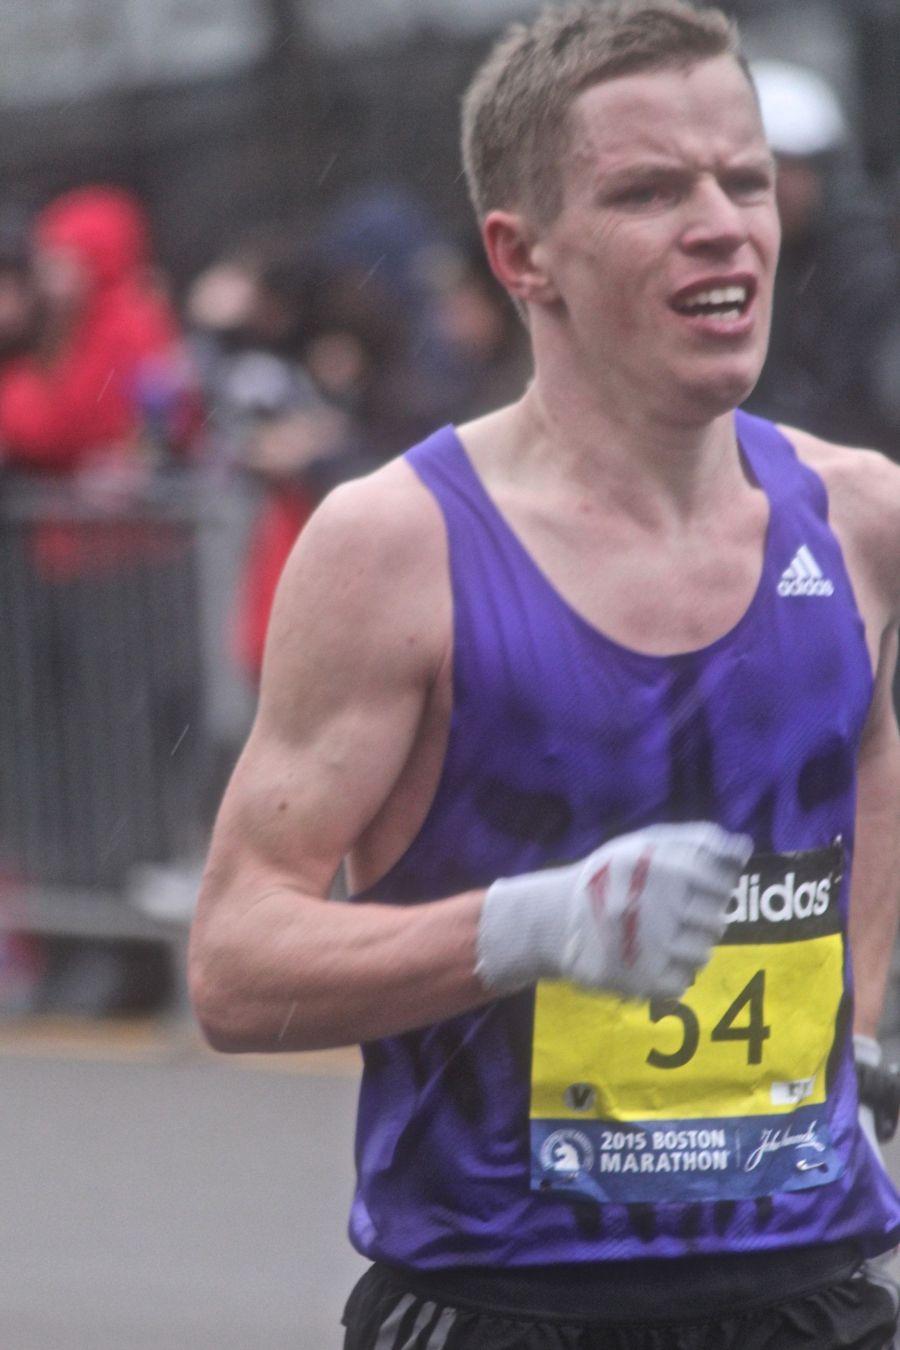 boston marathon april 20 2015 racer number 54